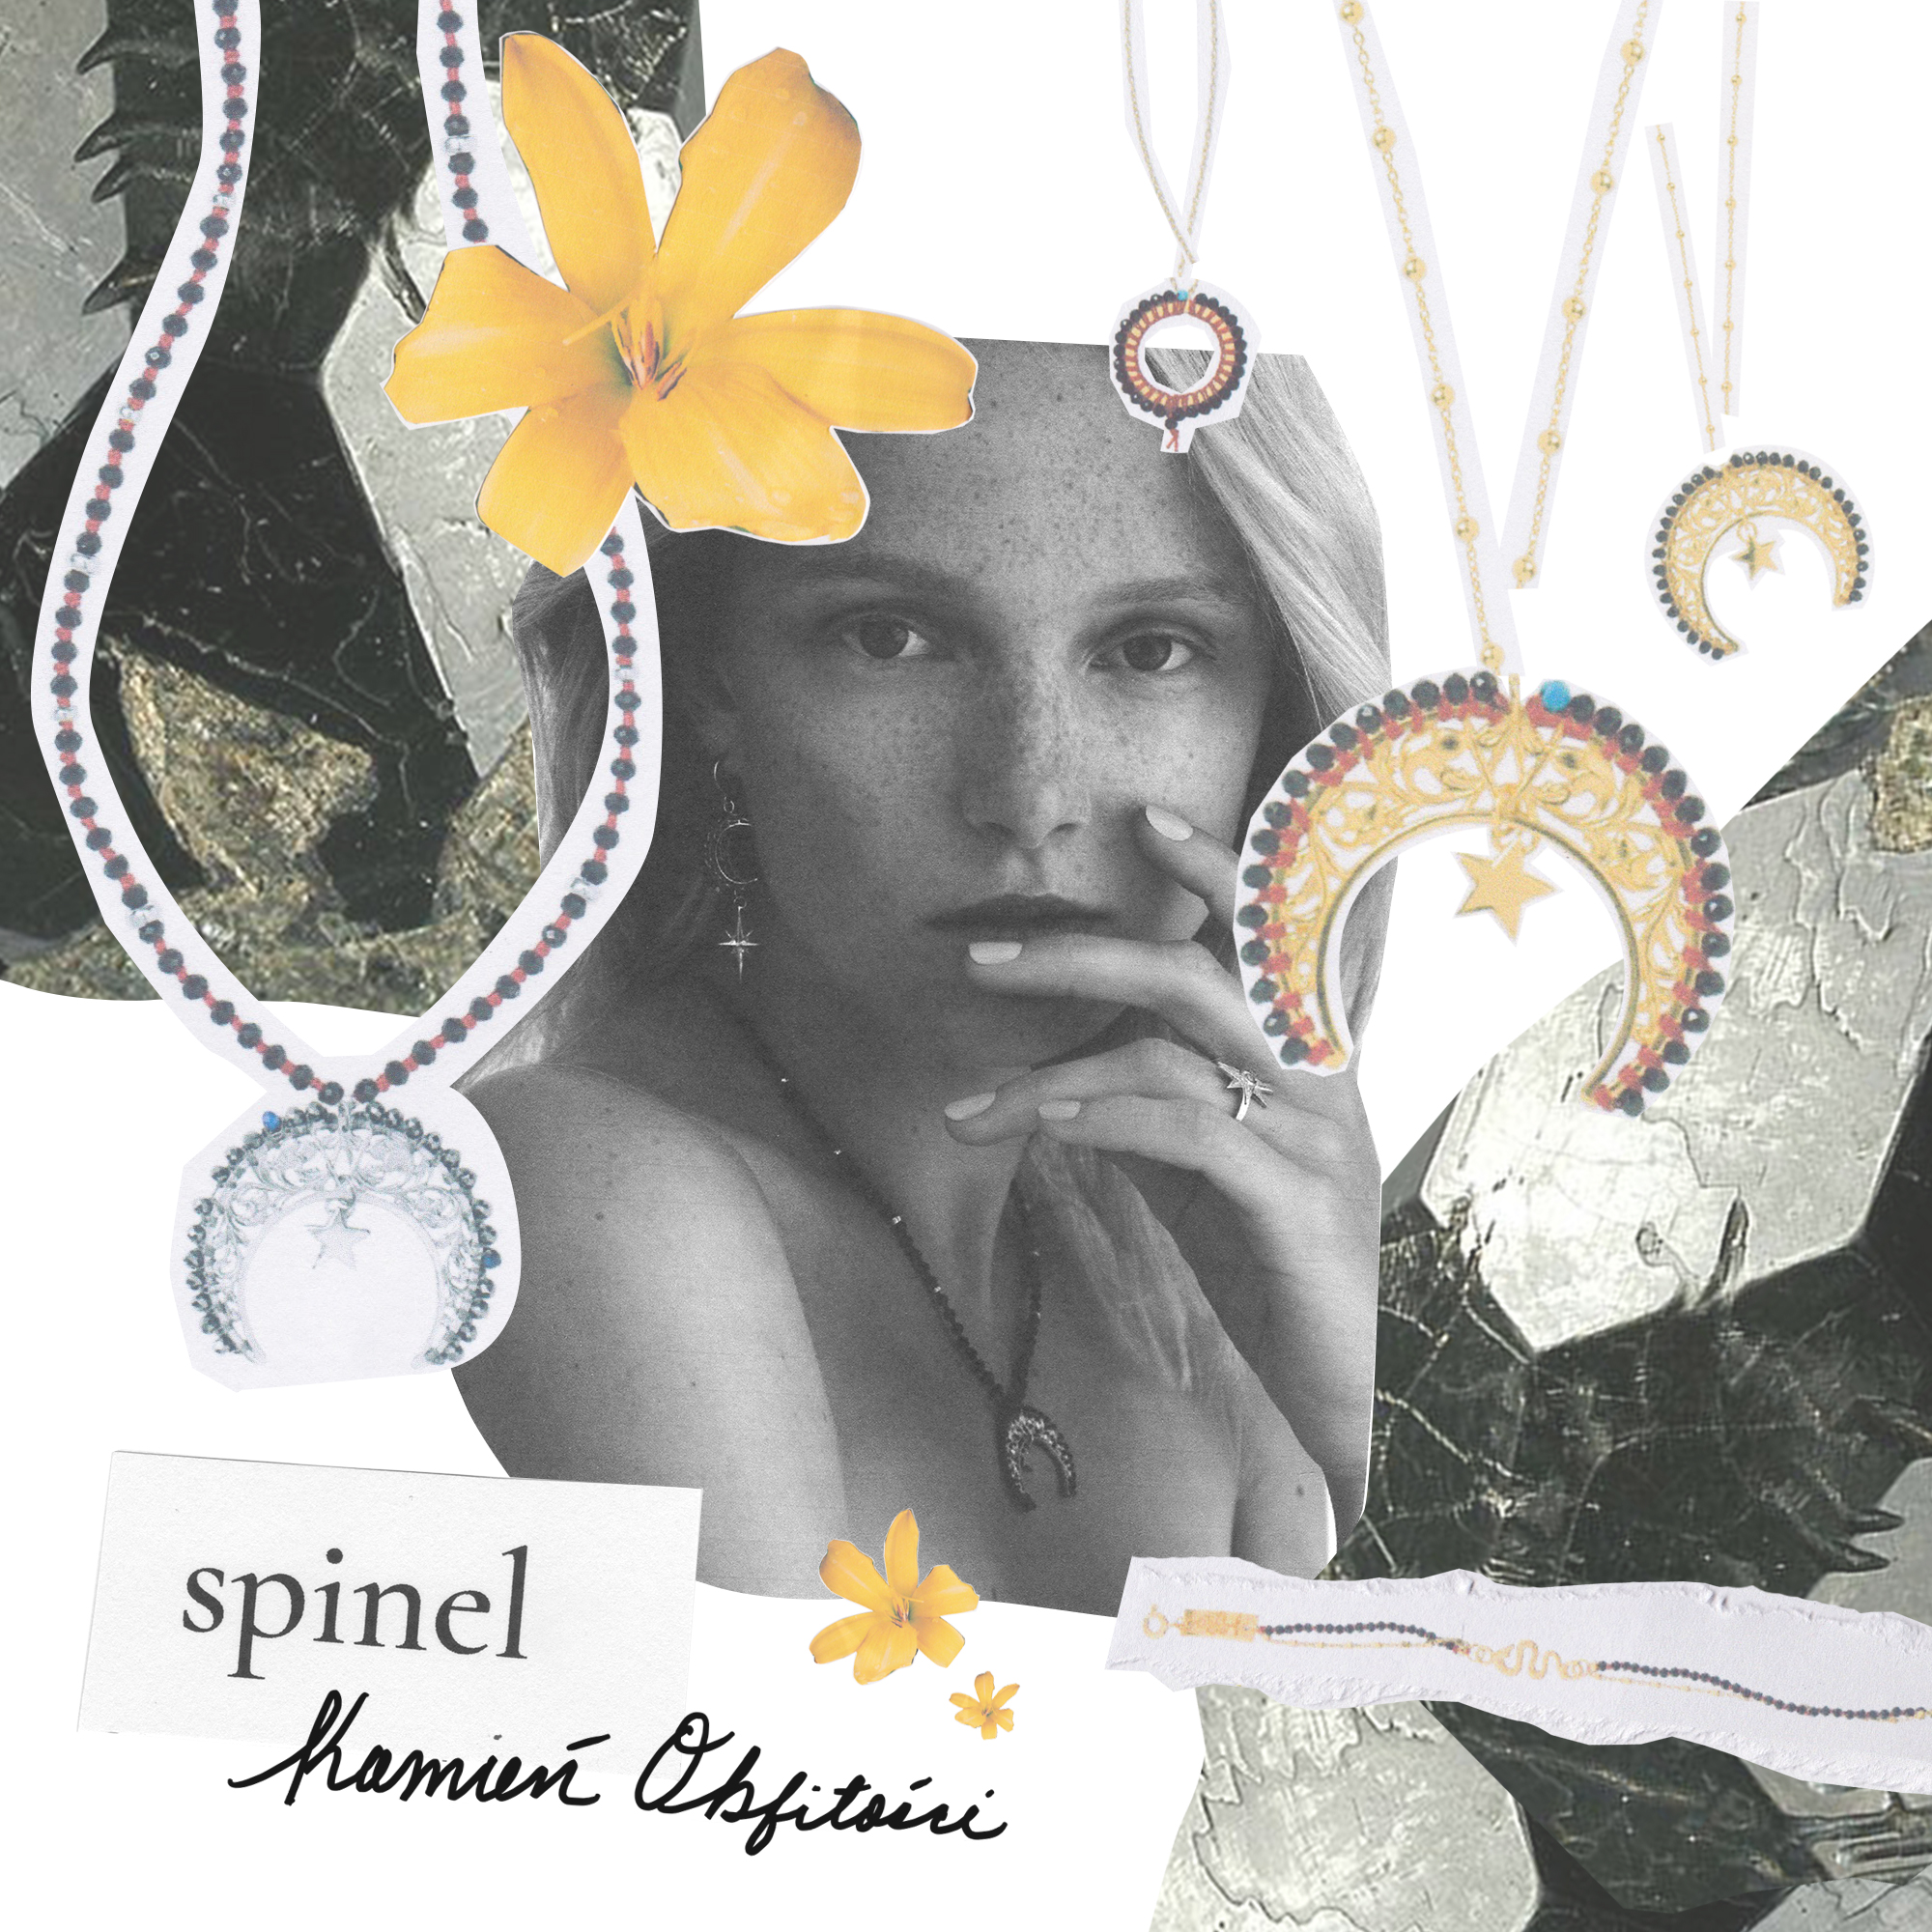 Spinel - blog Anka Krystyniak